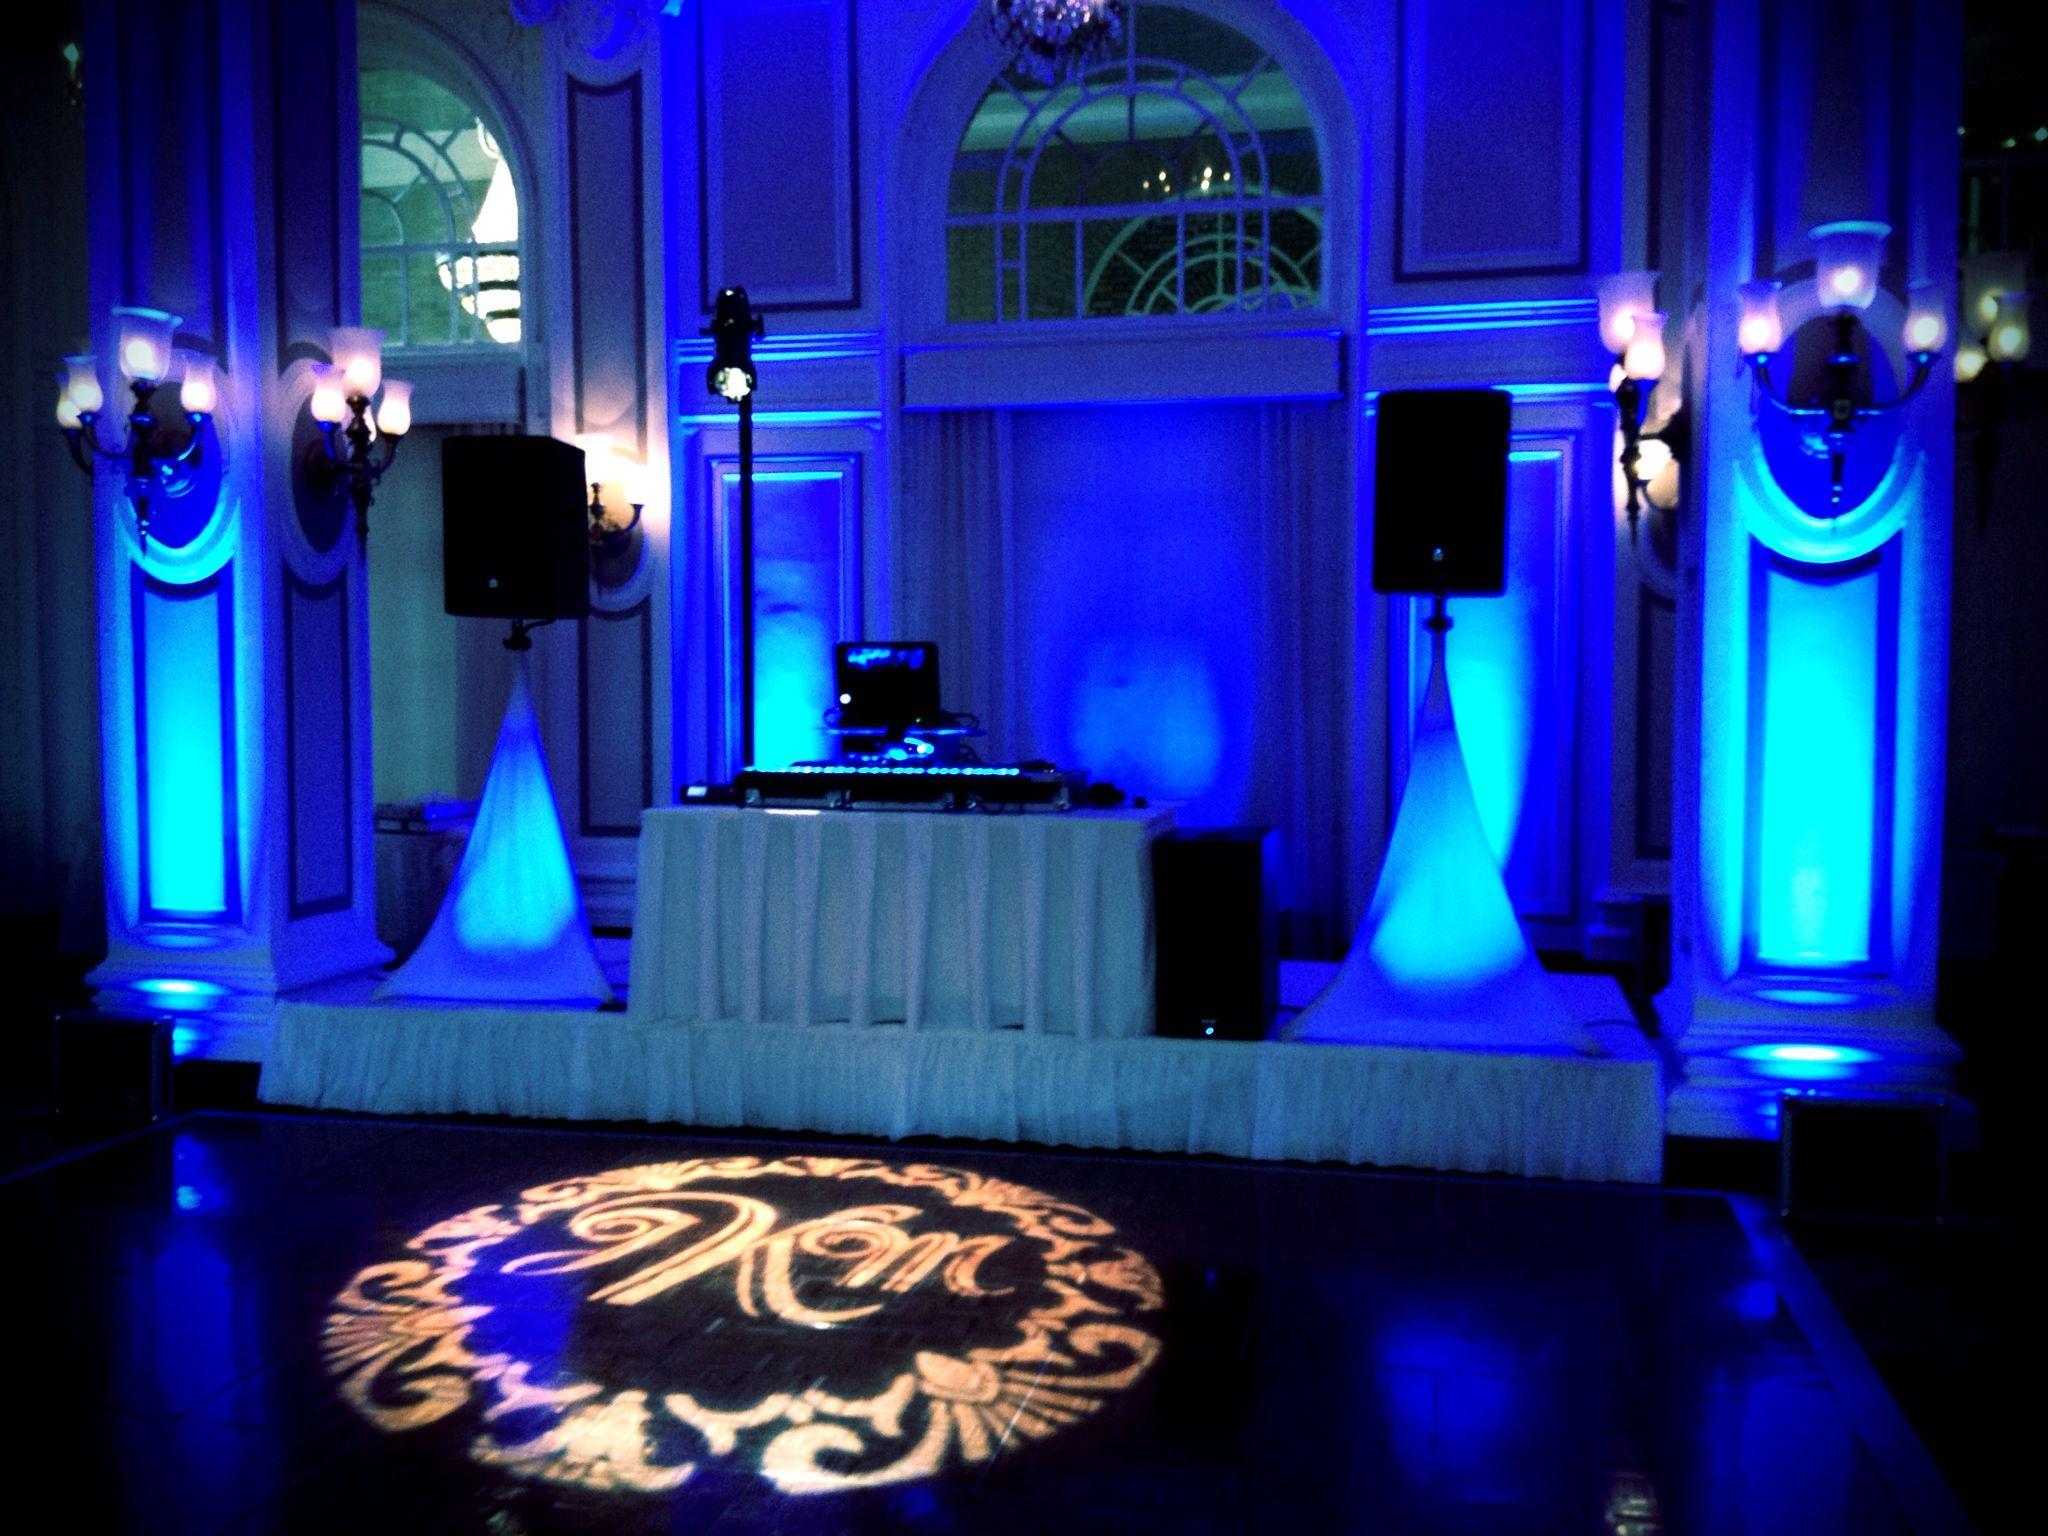 Fonix Entertainment Dj Lighting Setups Www Fonixentertainment Com Dj Equipment For Sale Event Lighting Wedding Dj Setup